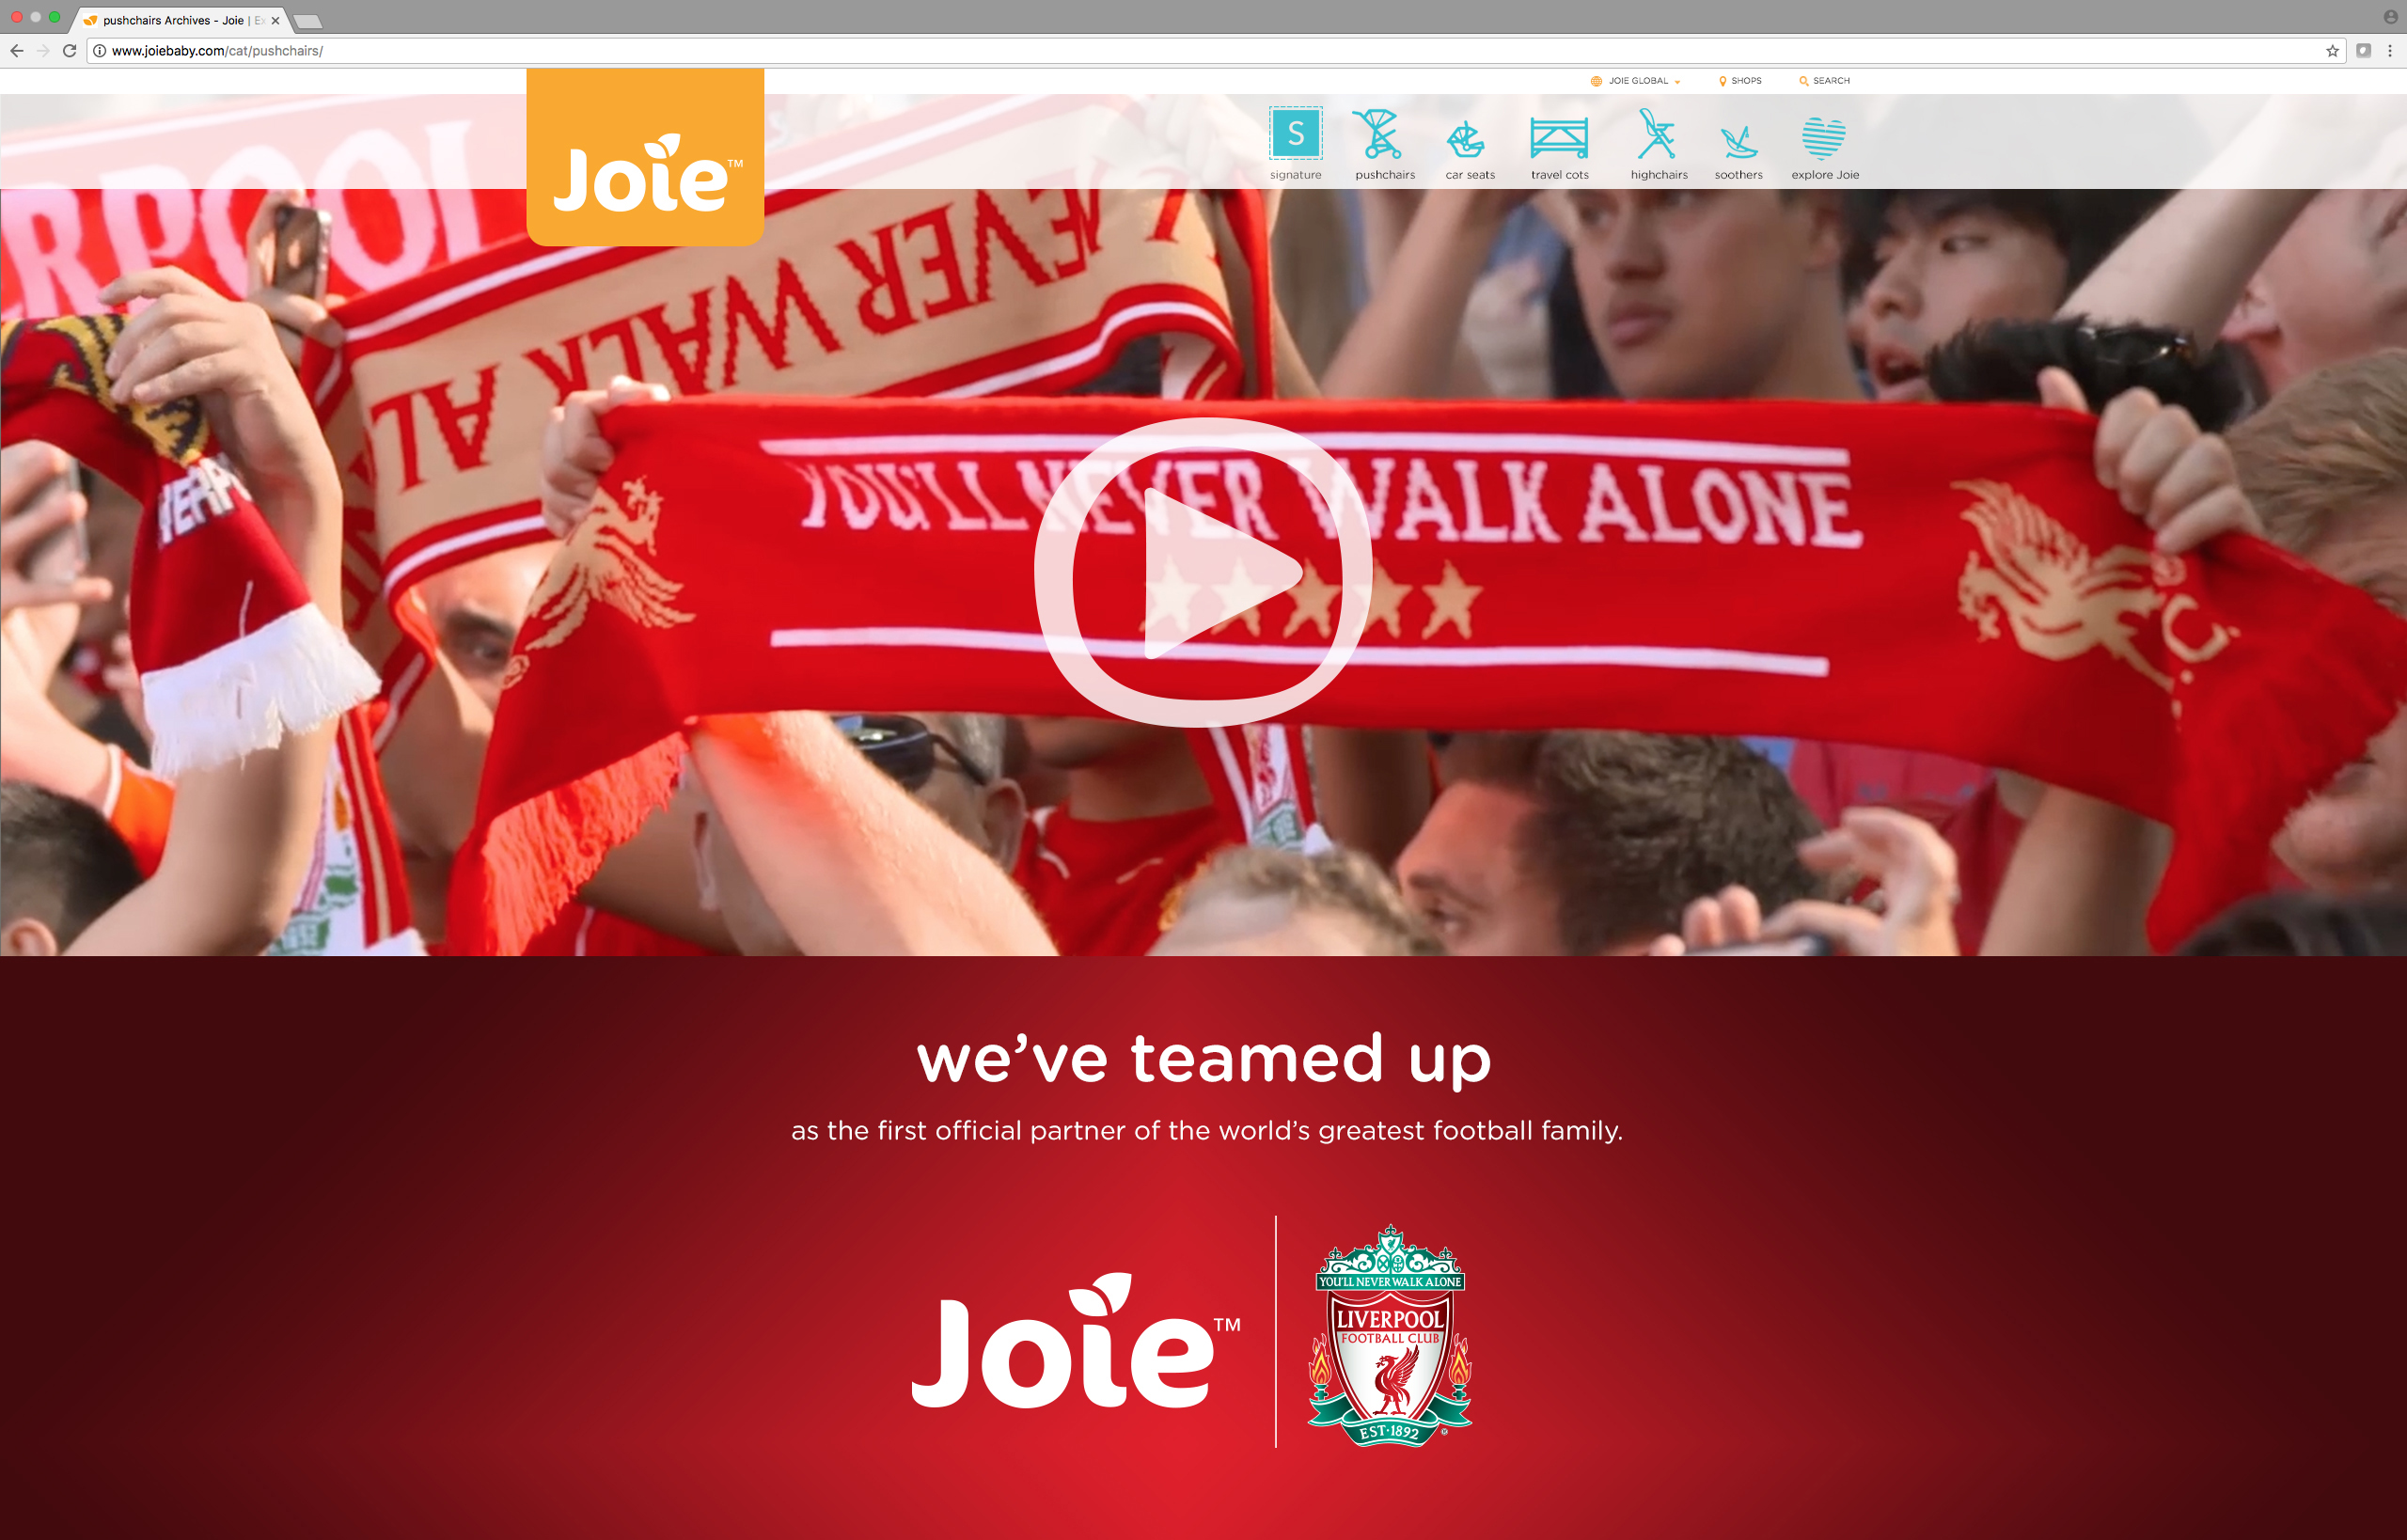 Joie Liverpool